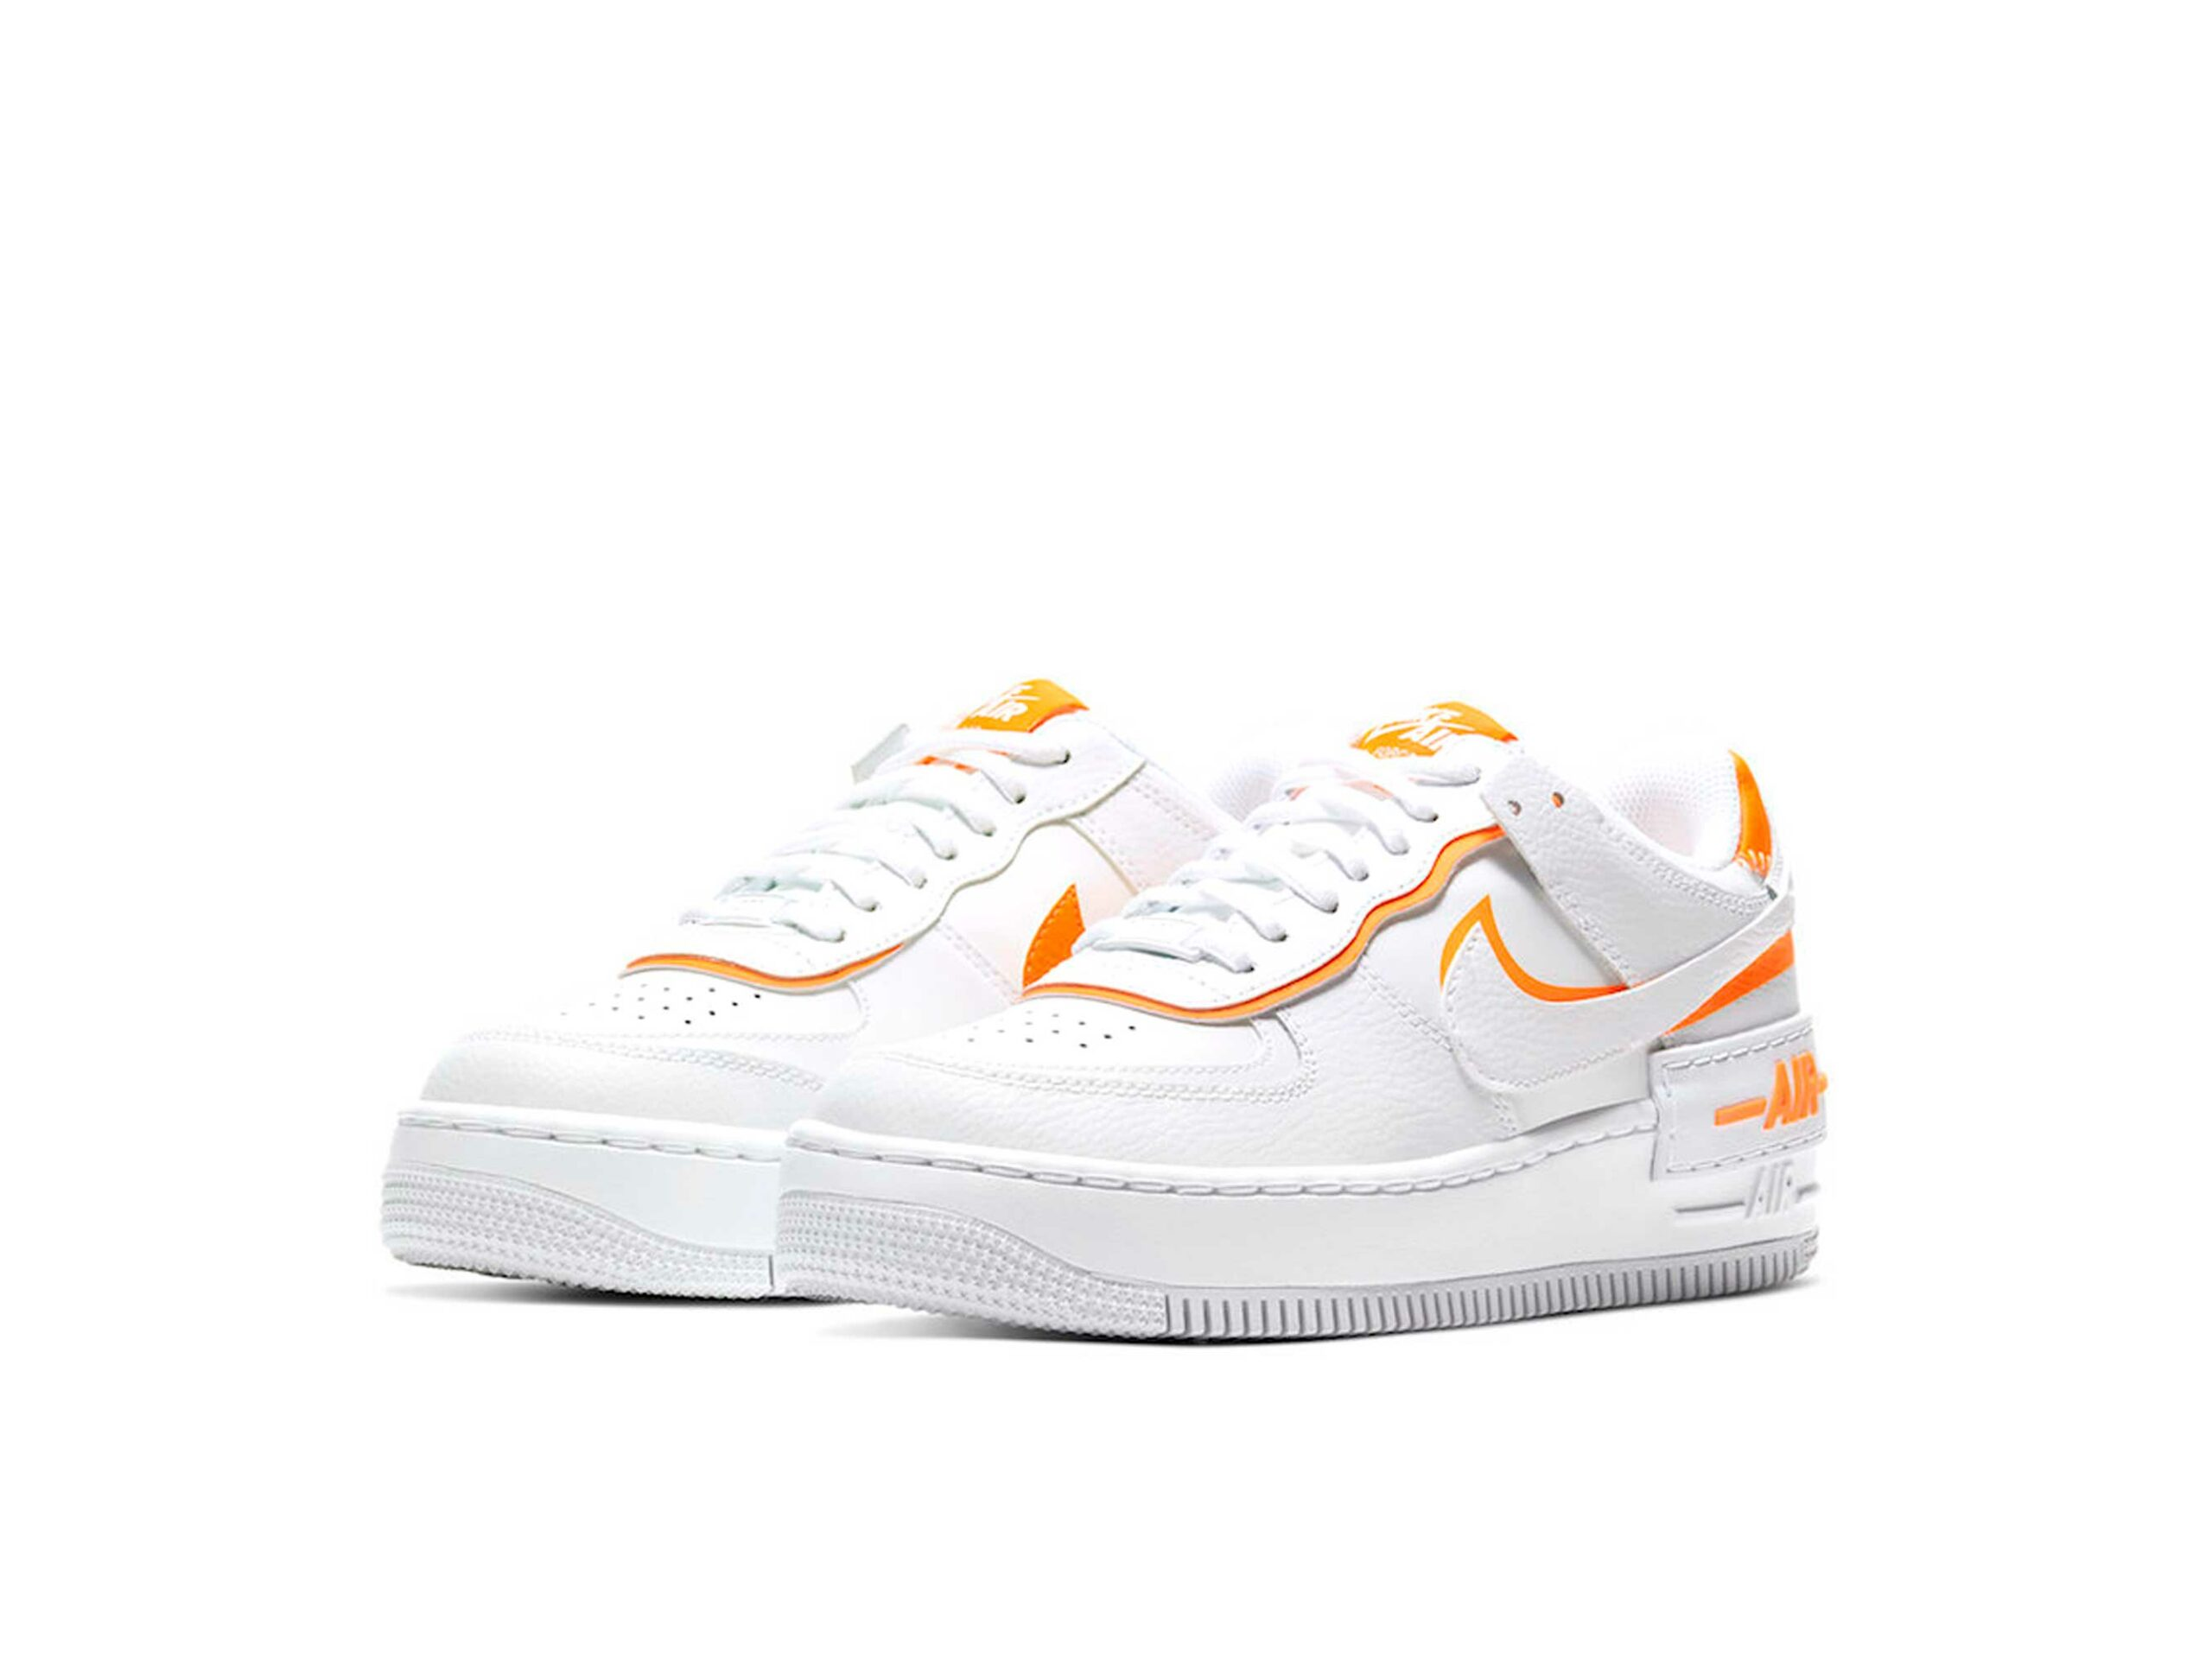 nike air force 1 shadow total orange CI0919_103 купить